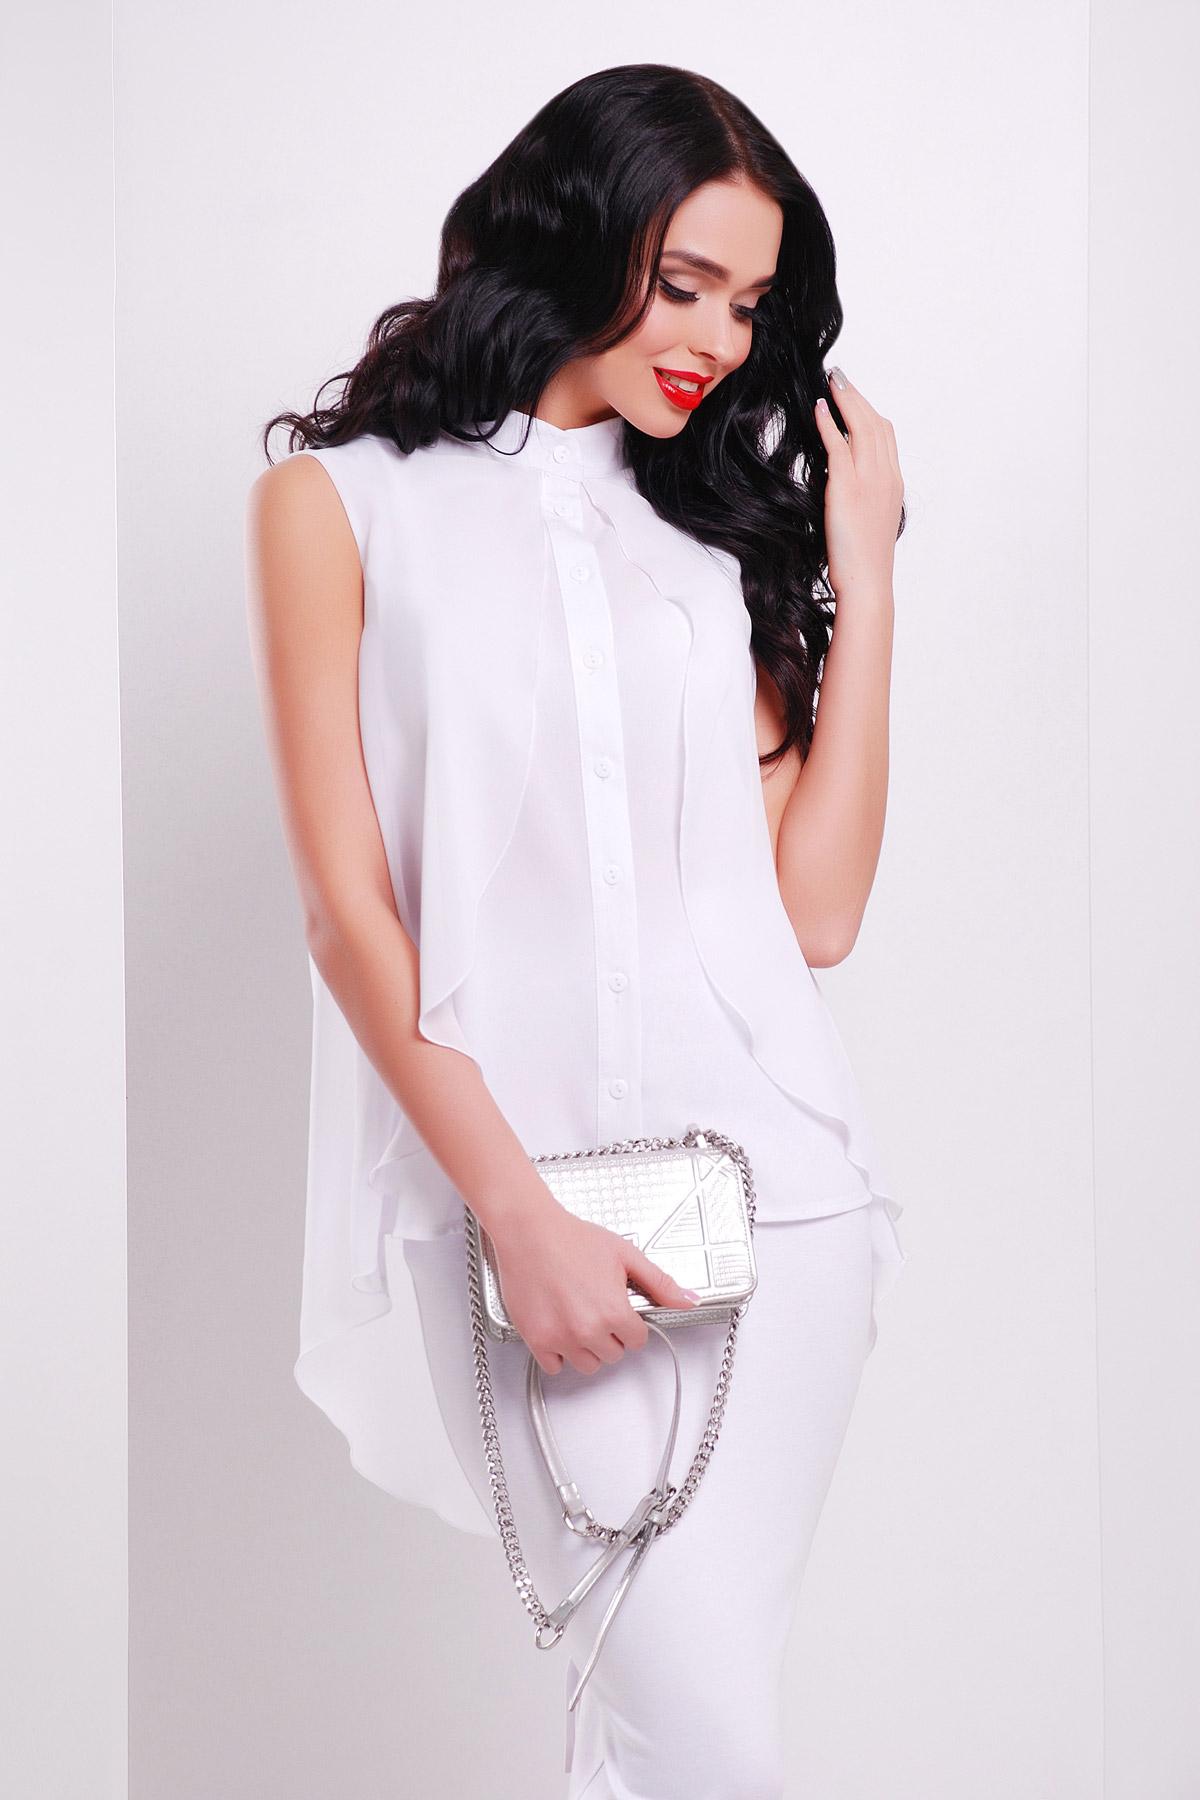 68e293e4943 Белая блузка с пелериной. блуза Санта-Круз б р. Цвет  белый